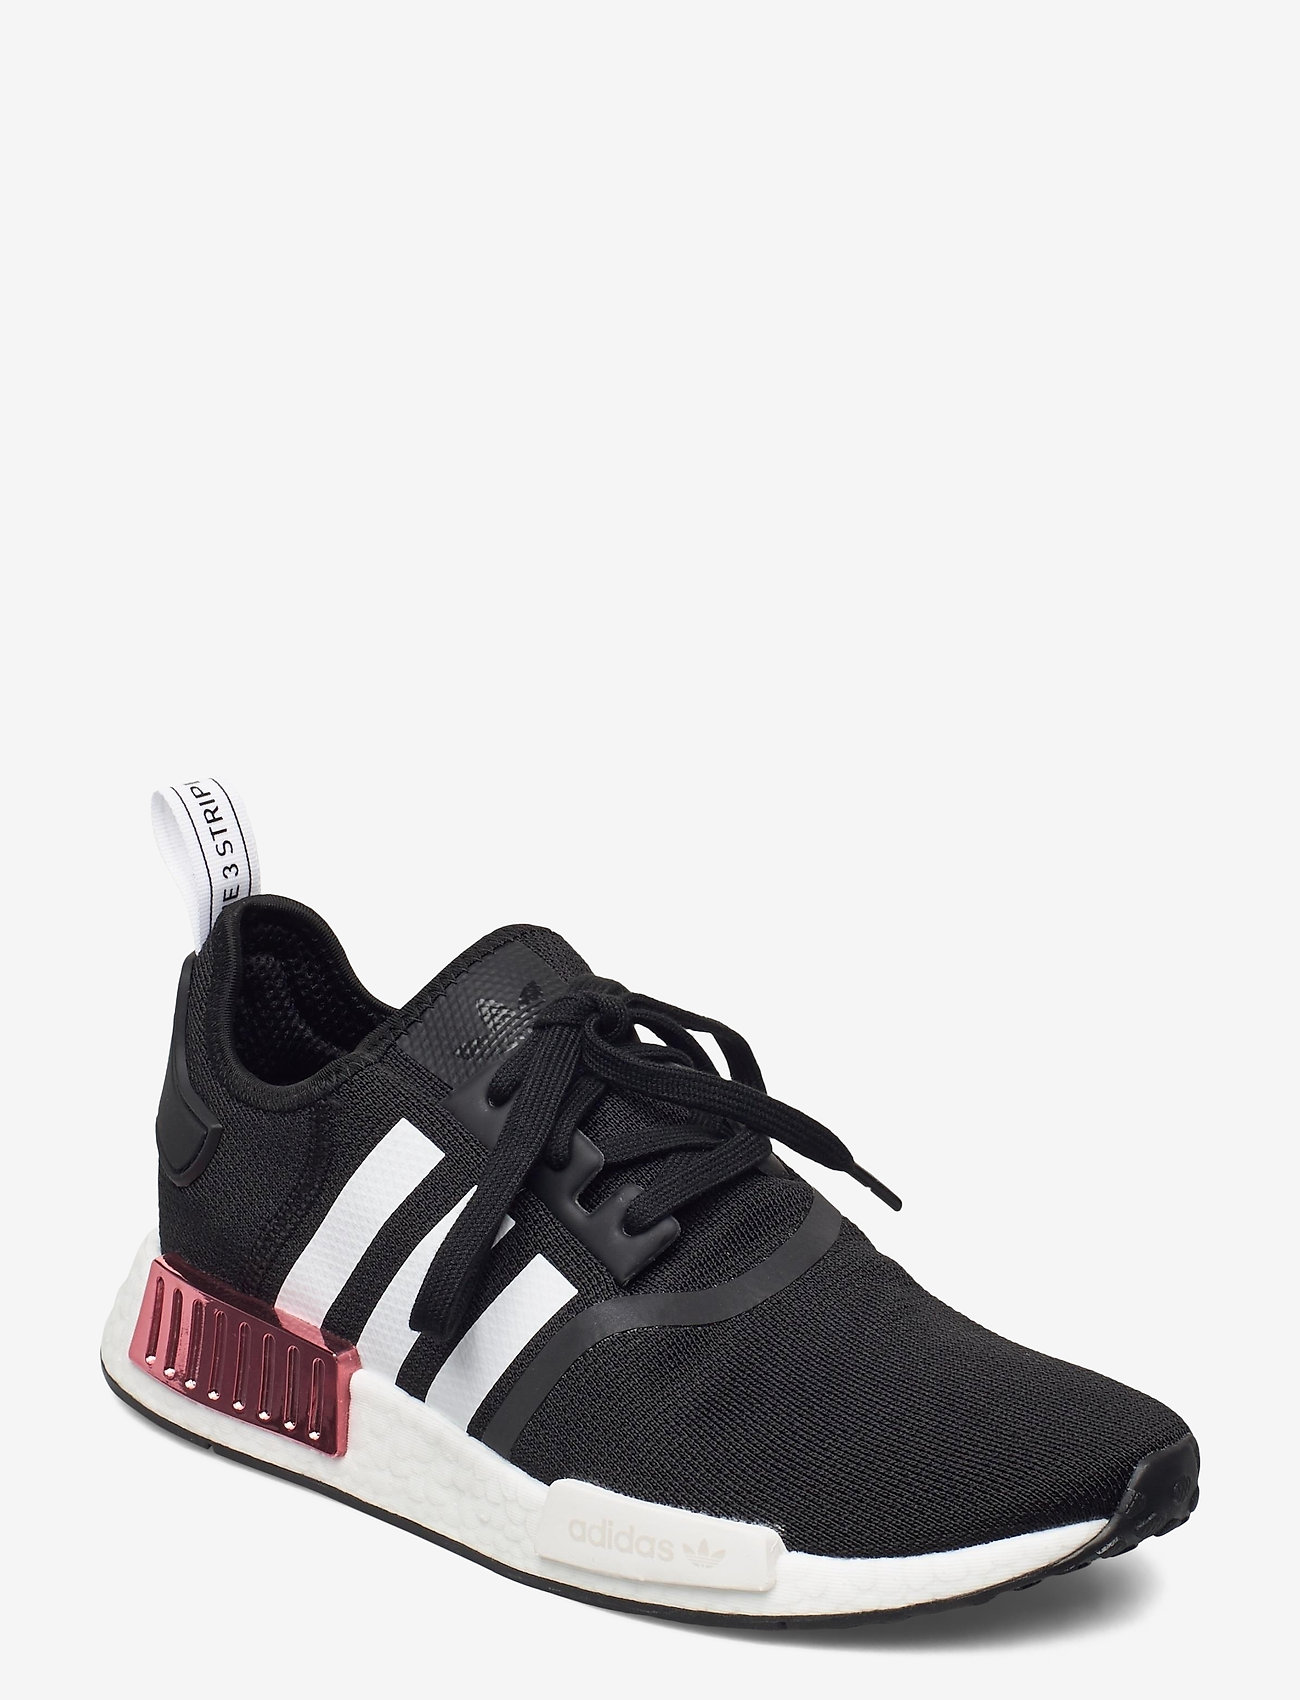 adidas Originals - NMD_R1 W - niedriger schnitt - cblack/ftwwht/hazros - 0